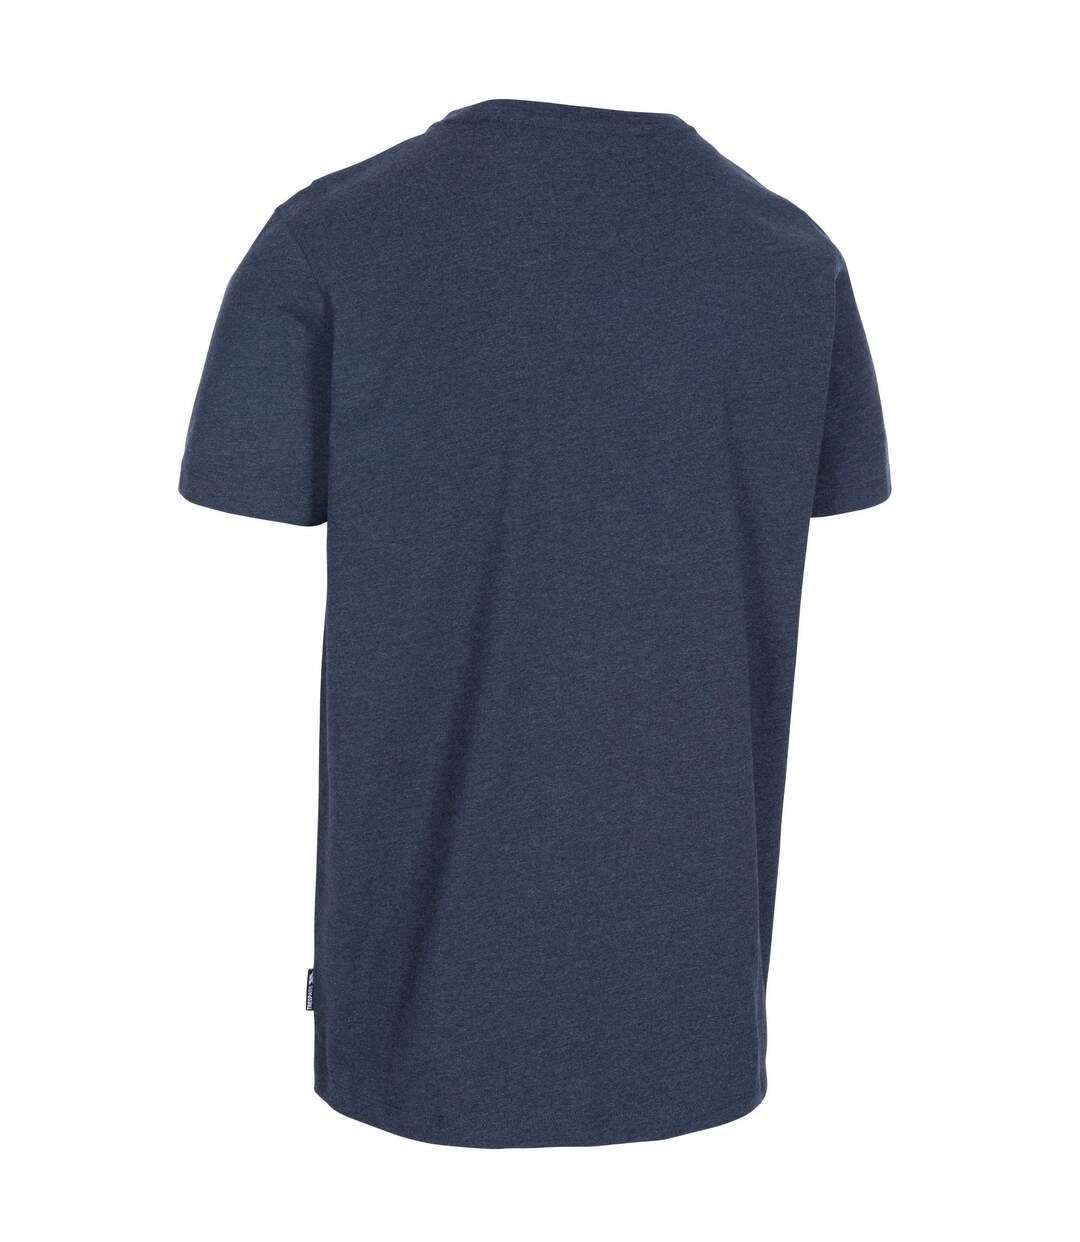 Trespass Mens Buzzinley T-Shirt (Olive Marl) - UTTP4970